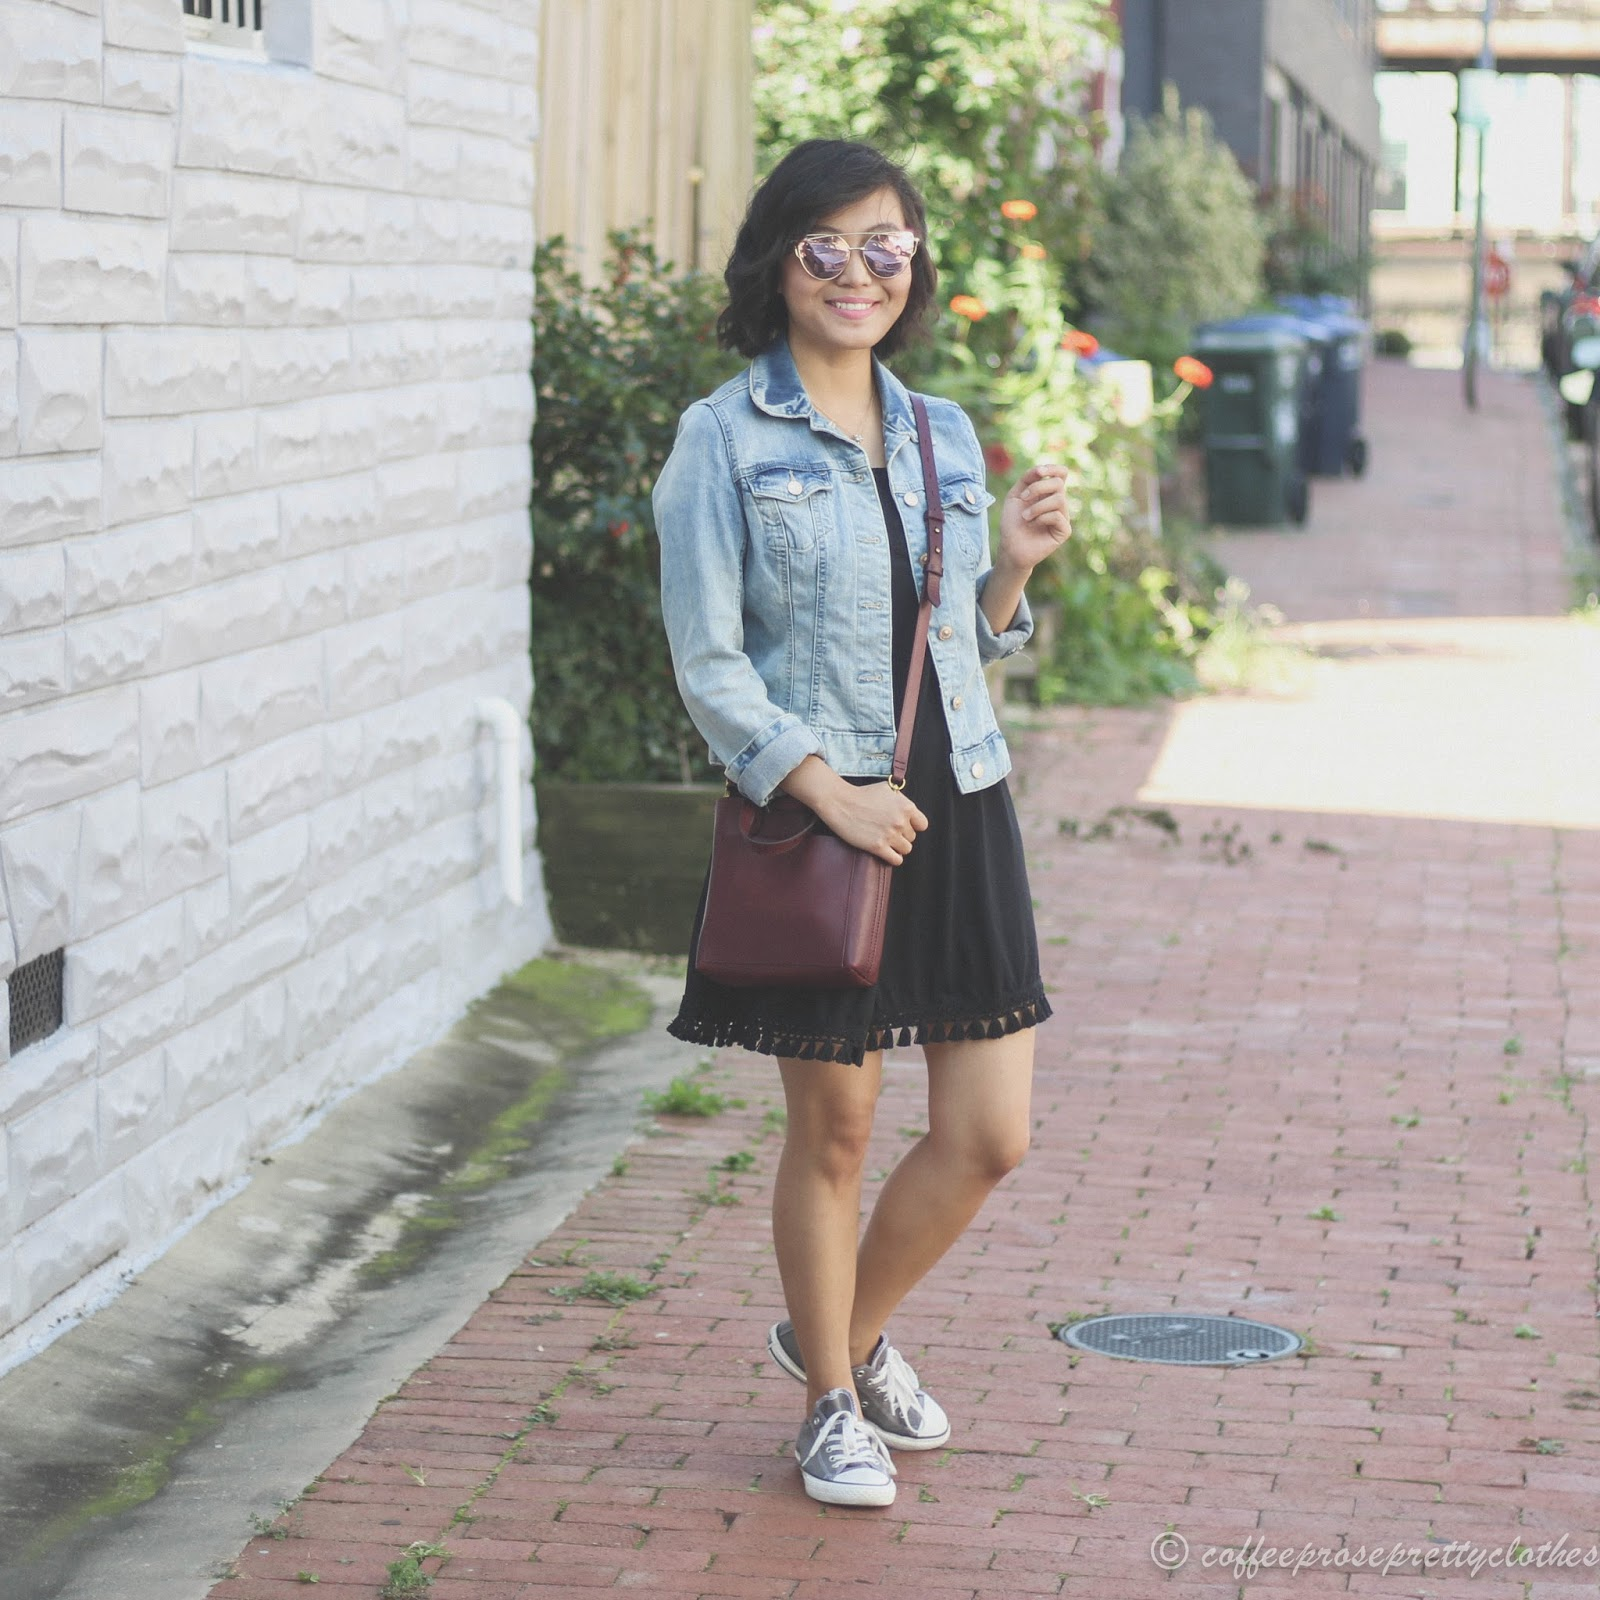 Madewell Small Transport tote, ASOS tassel dress, Convers chucks, Mirrored sunglasses, Denim jacket